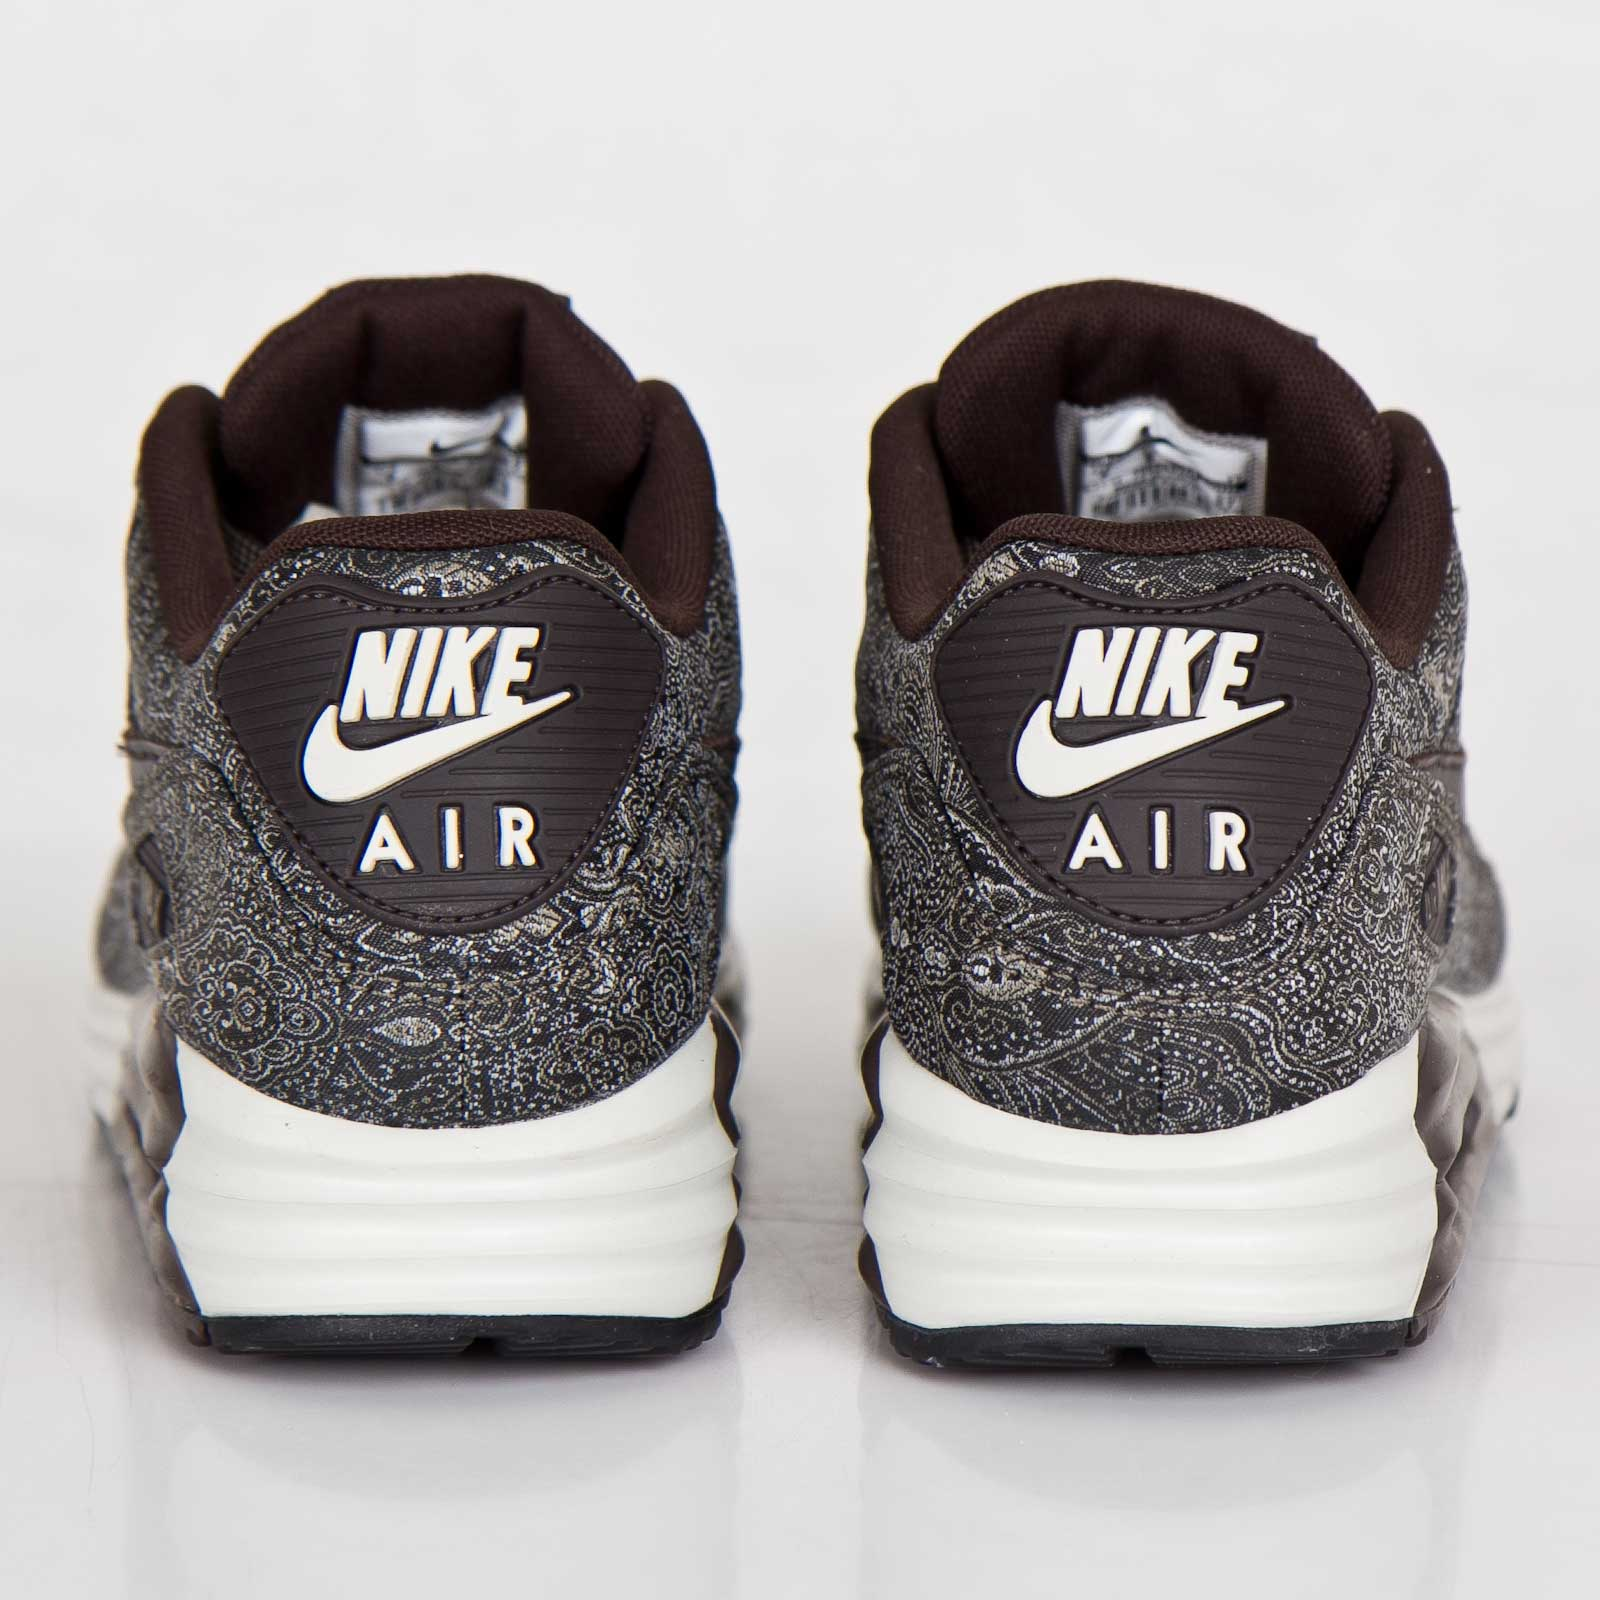 new styles 15ea3 e8260 Nike Air Max Lunar90 Premium QS - 705068-201 - Sneakersnstuff   sneakers    streetwear online since 1999